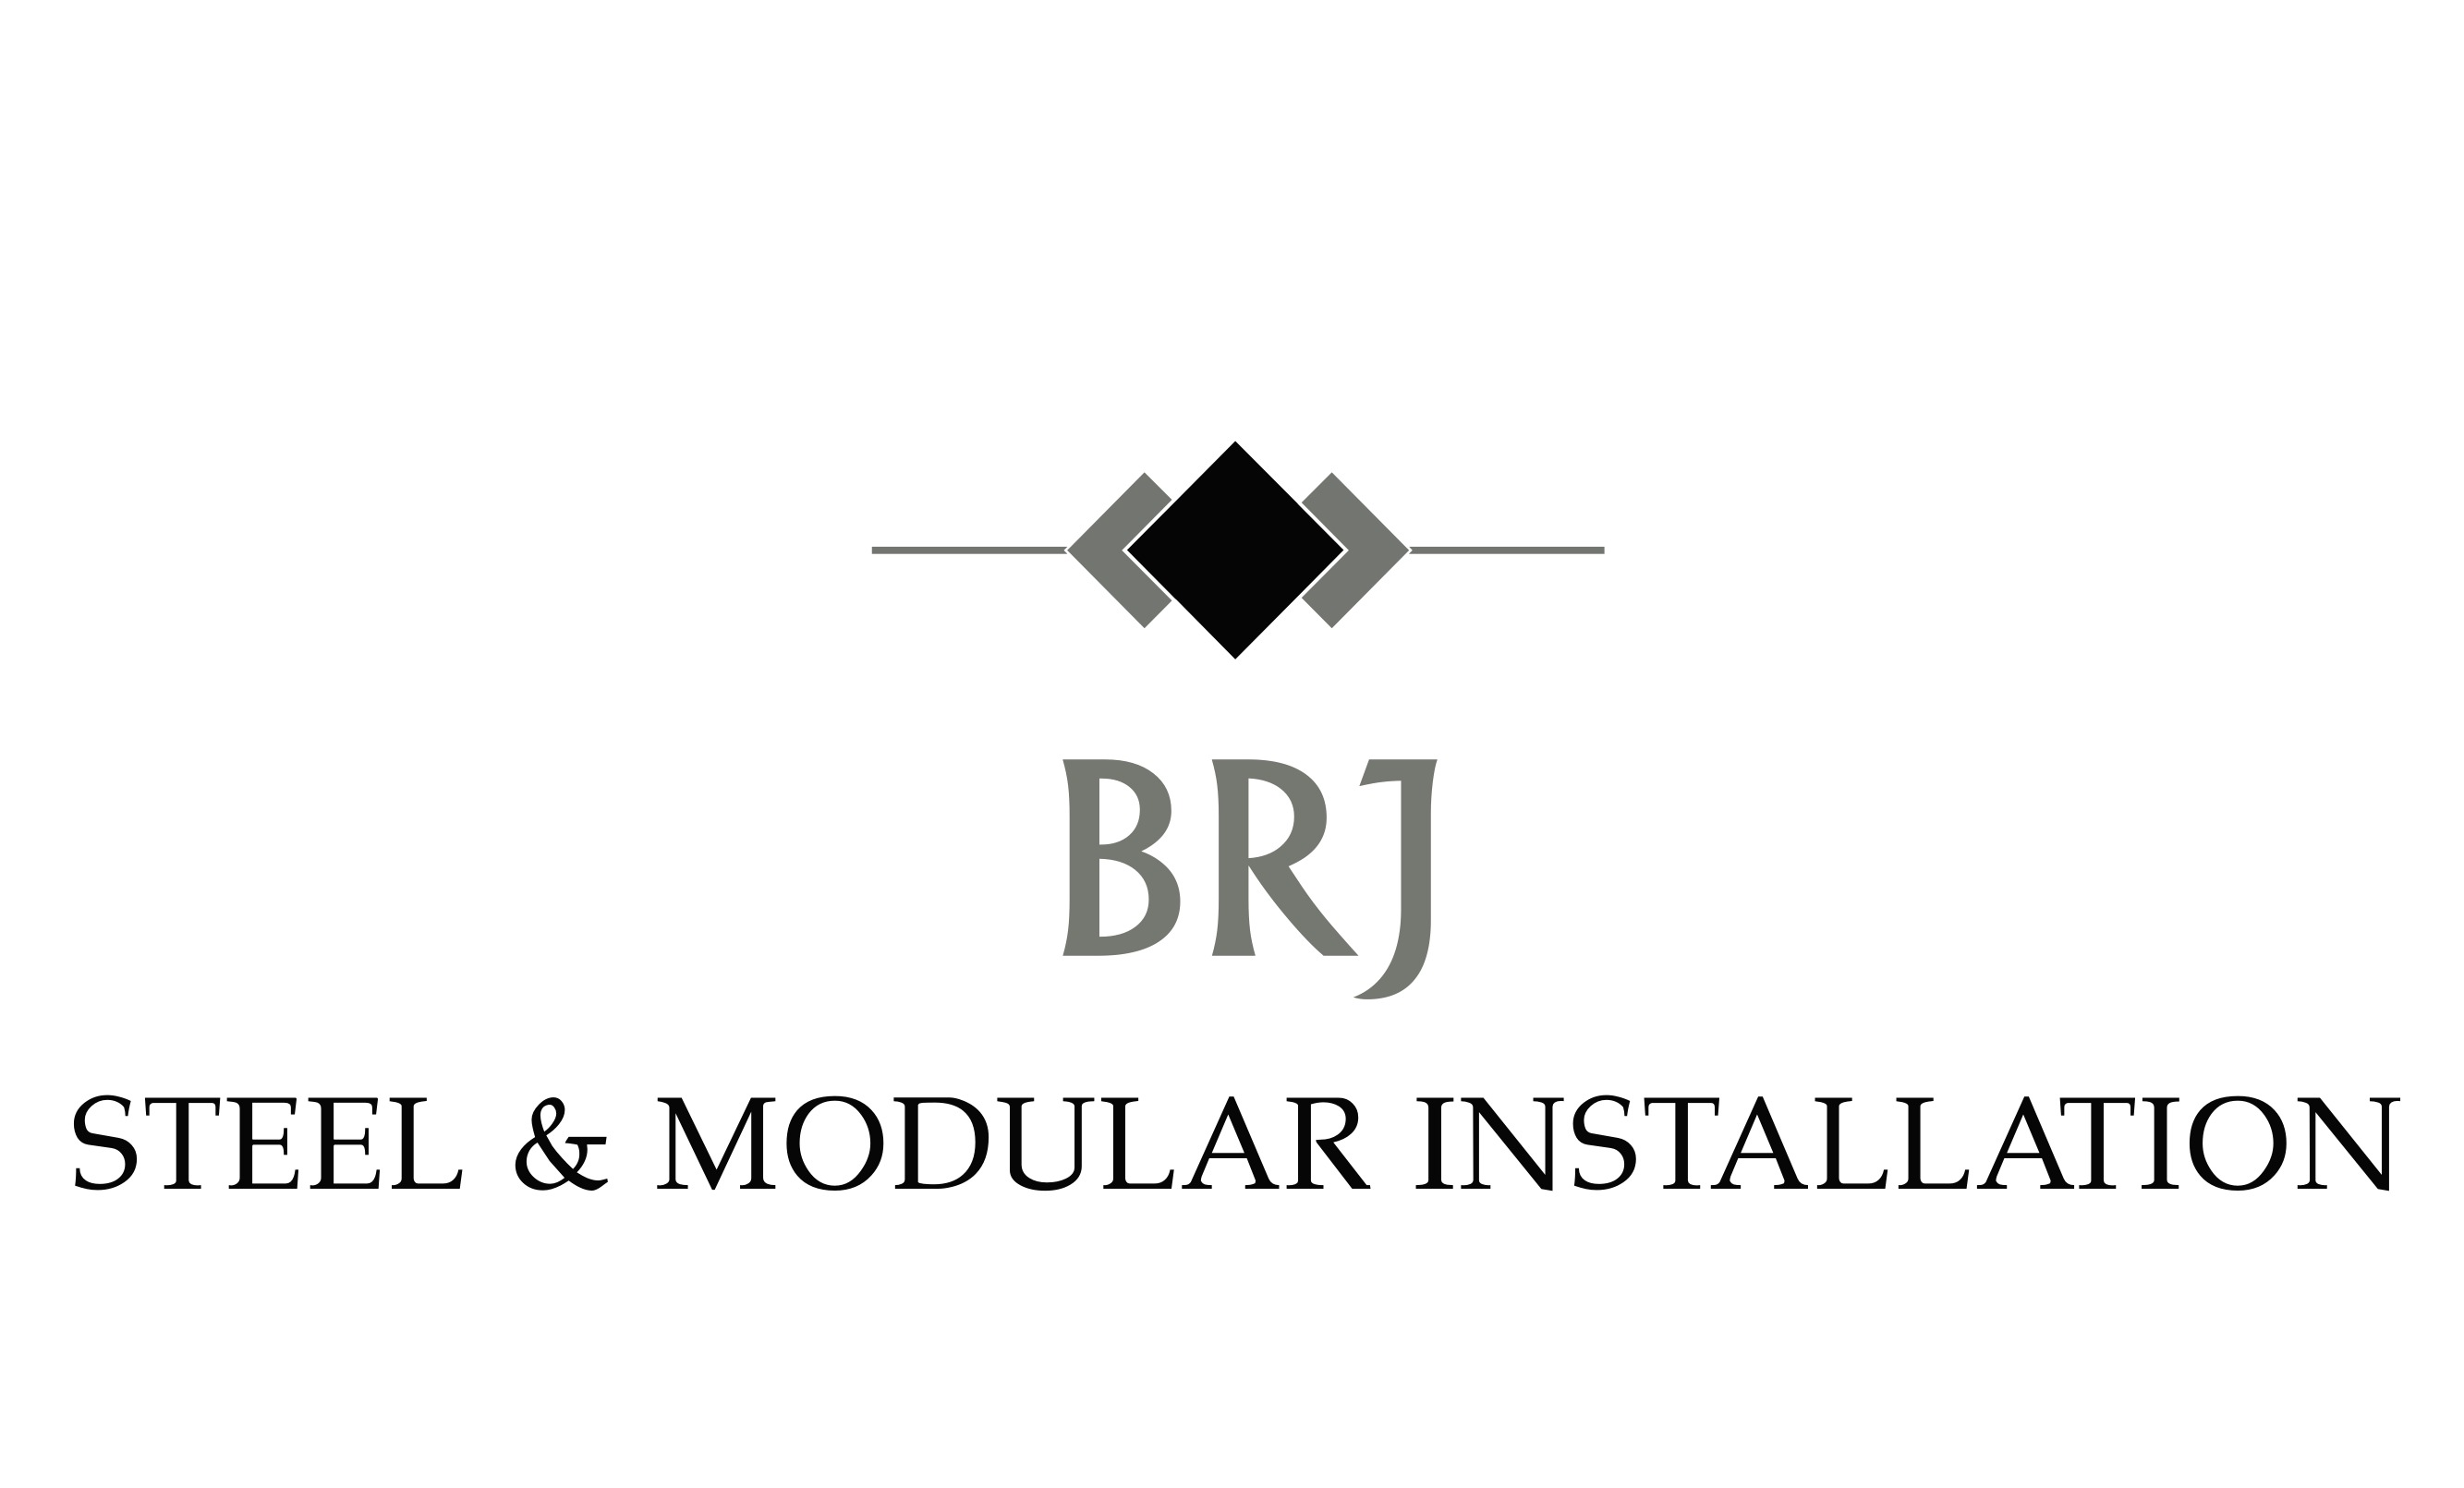 BRJ Steel & Modular Installation